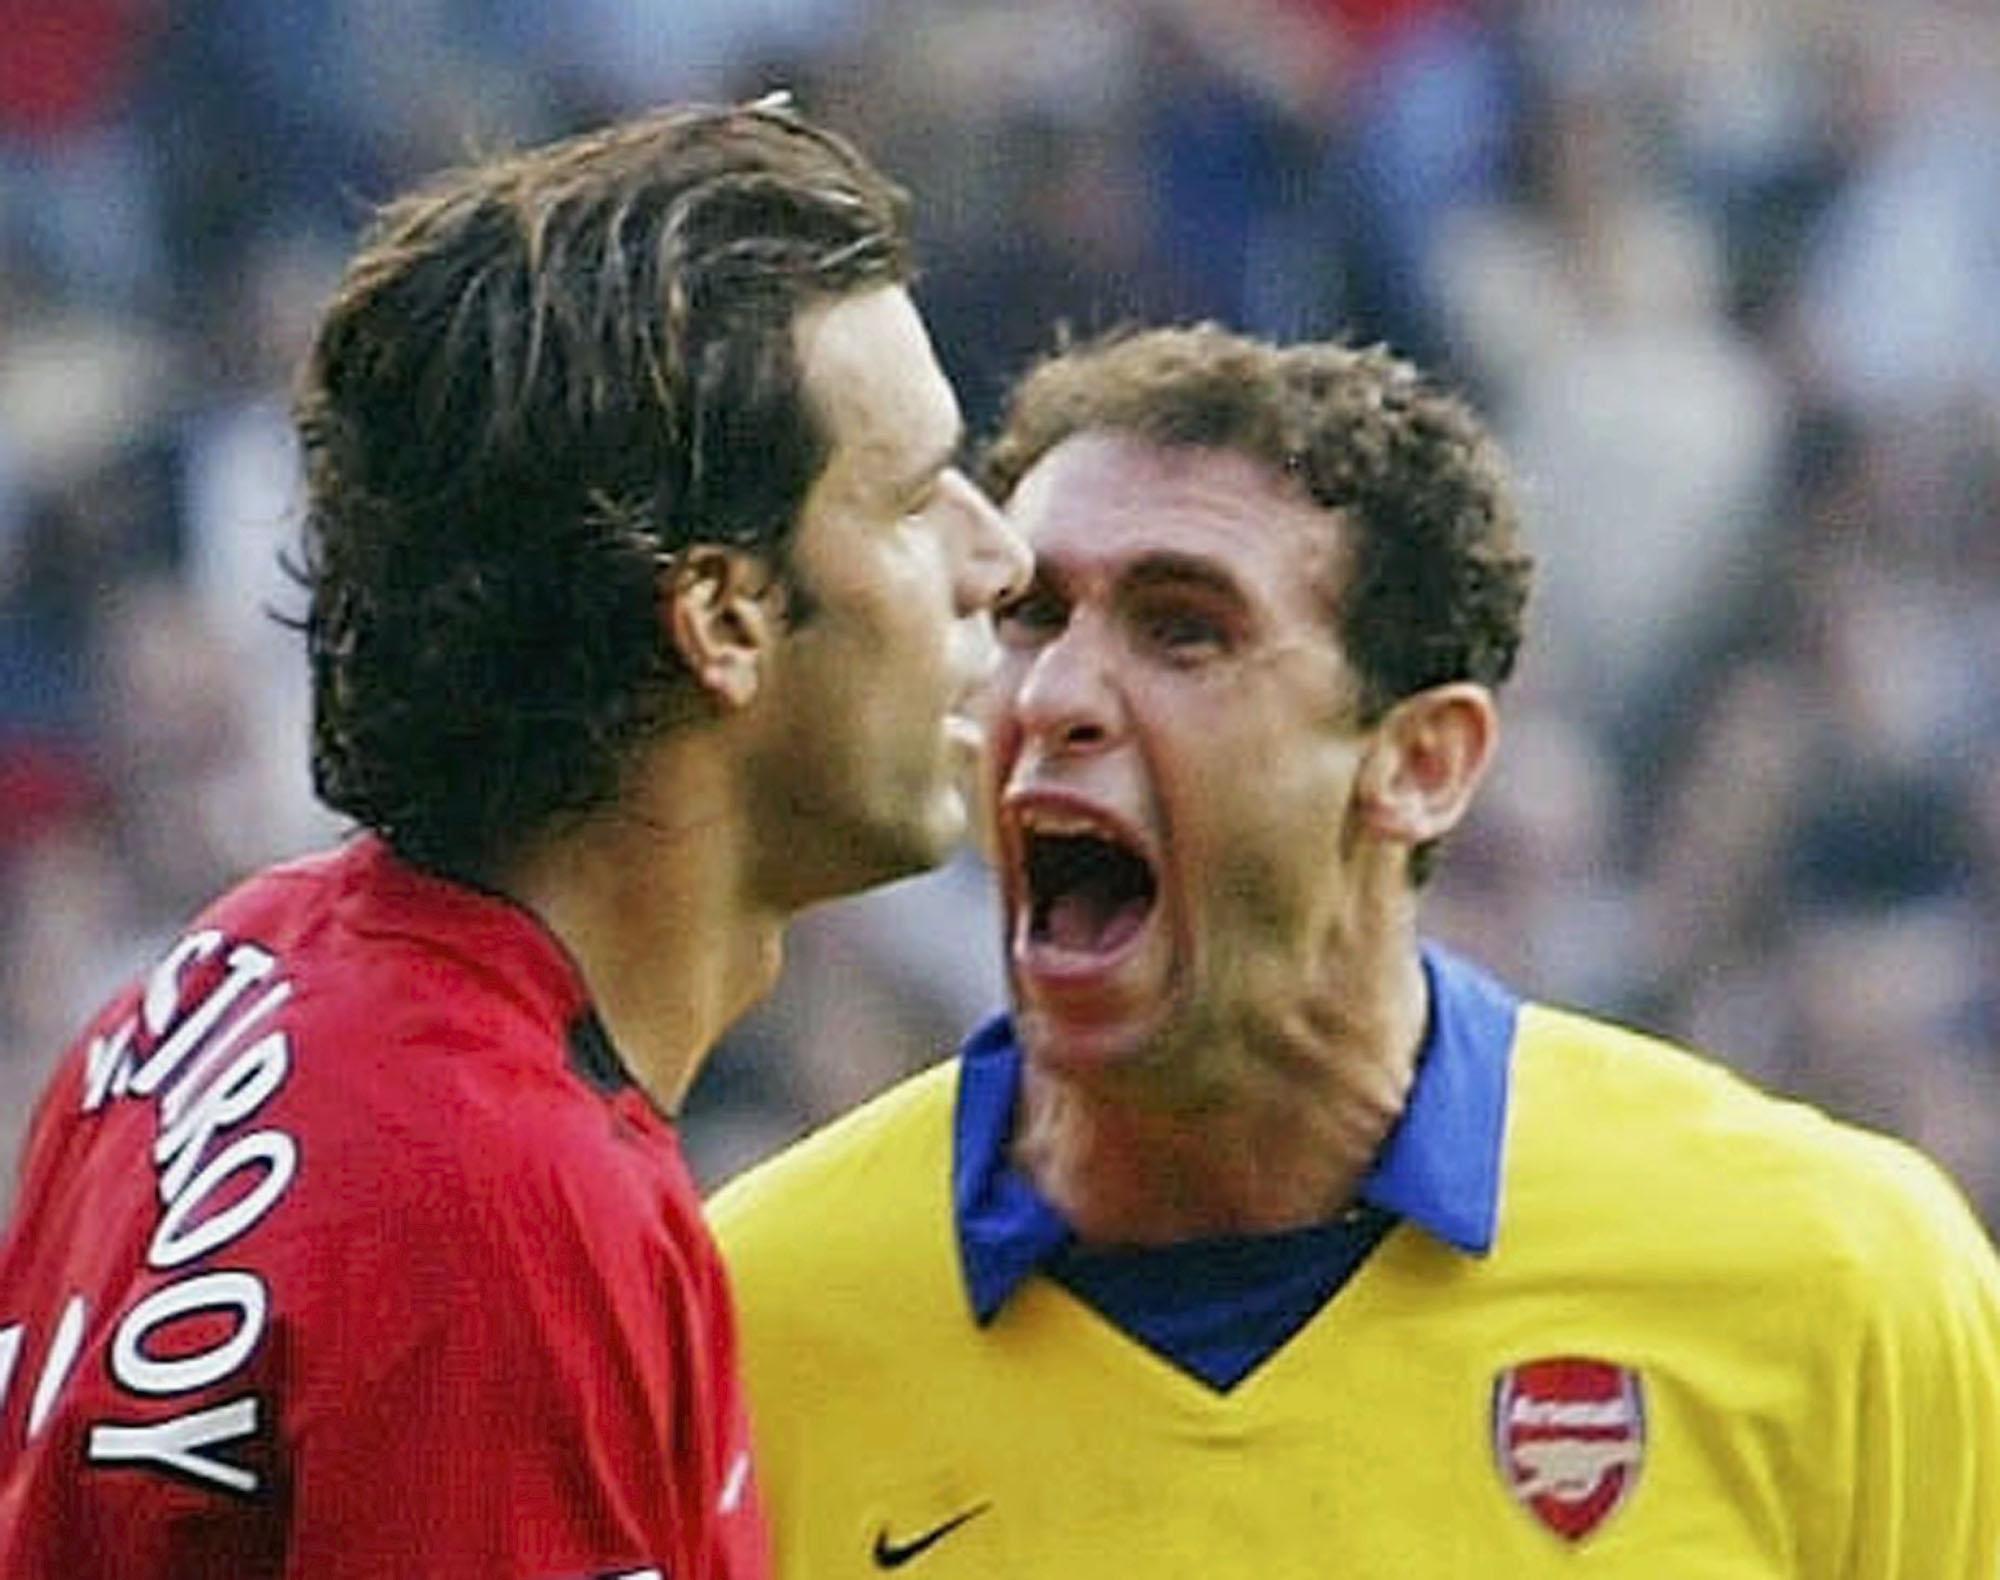 Martin Keown and Ruud Van Nistelrooy argue